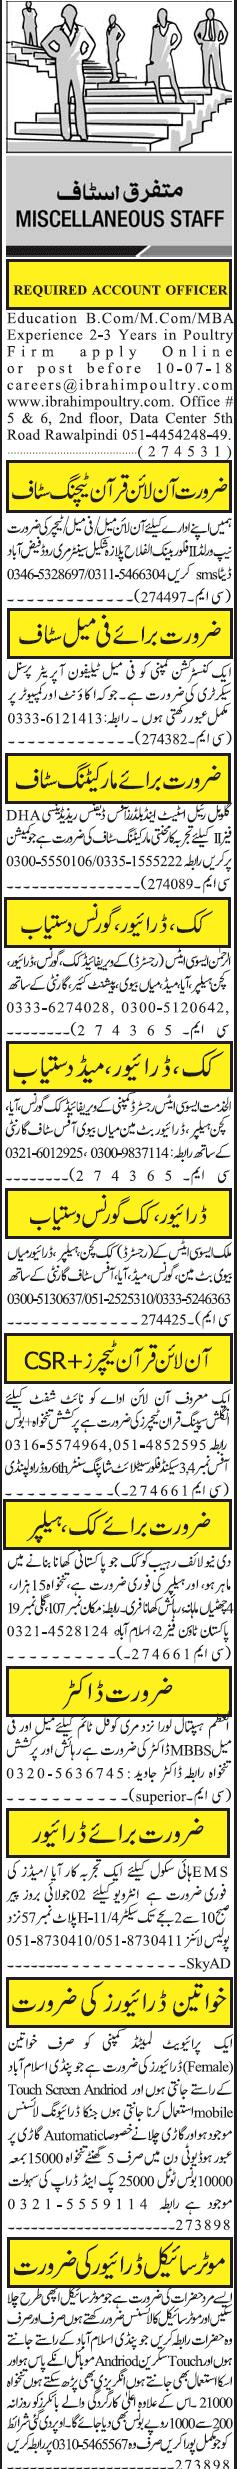 Accountant, Online Quran Teachers Job Opportunity